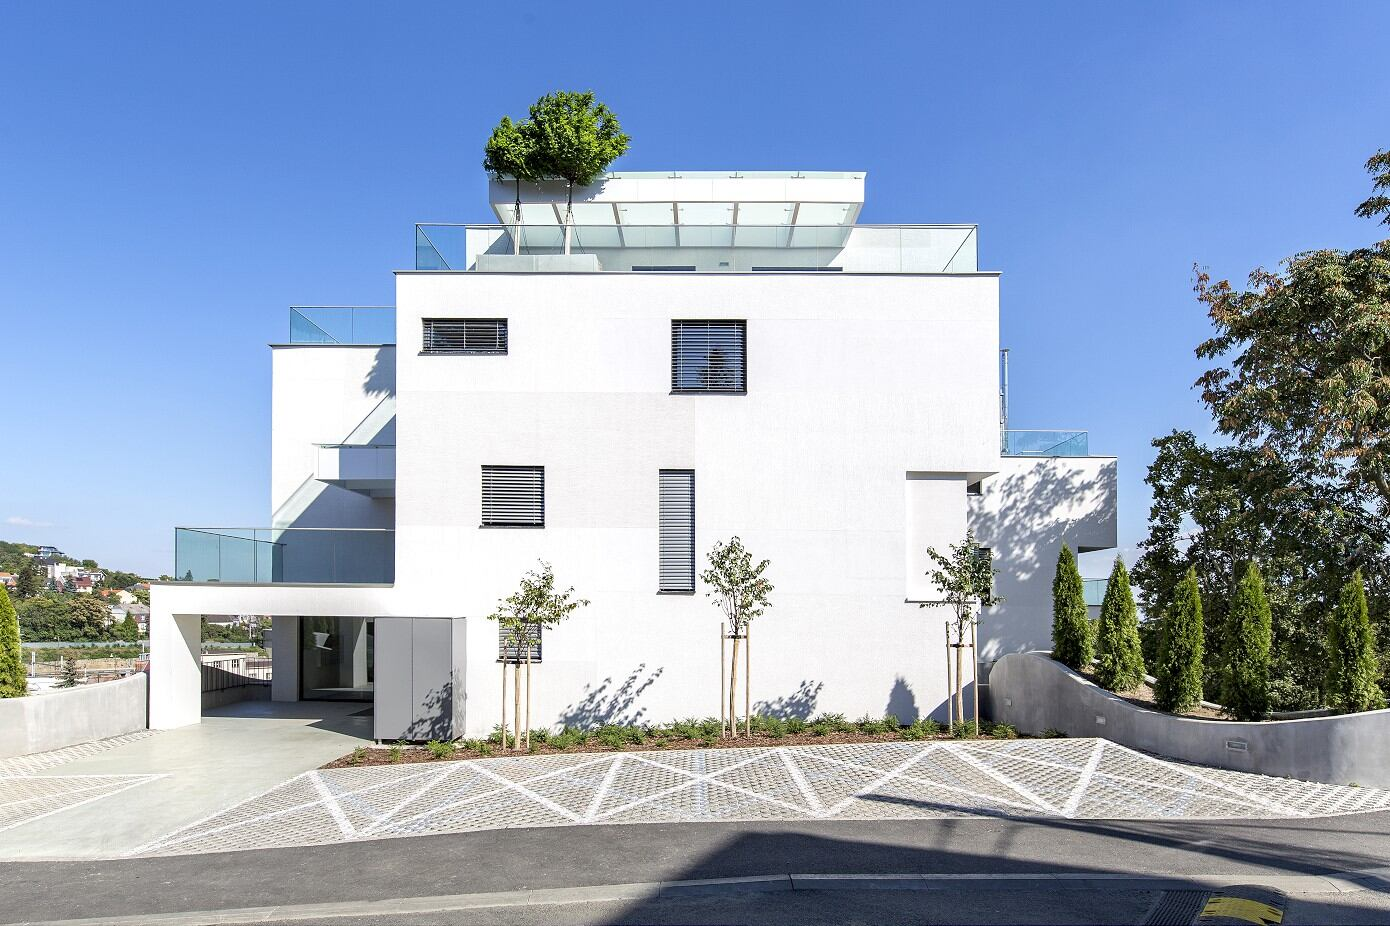 Sokolská Residence by Architekti Šebo Lichý